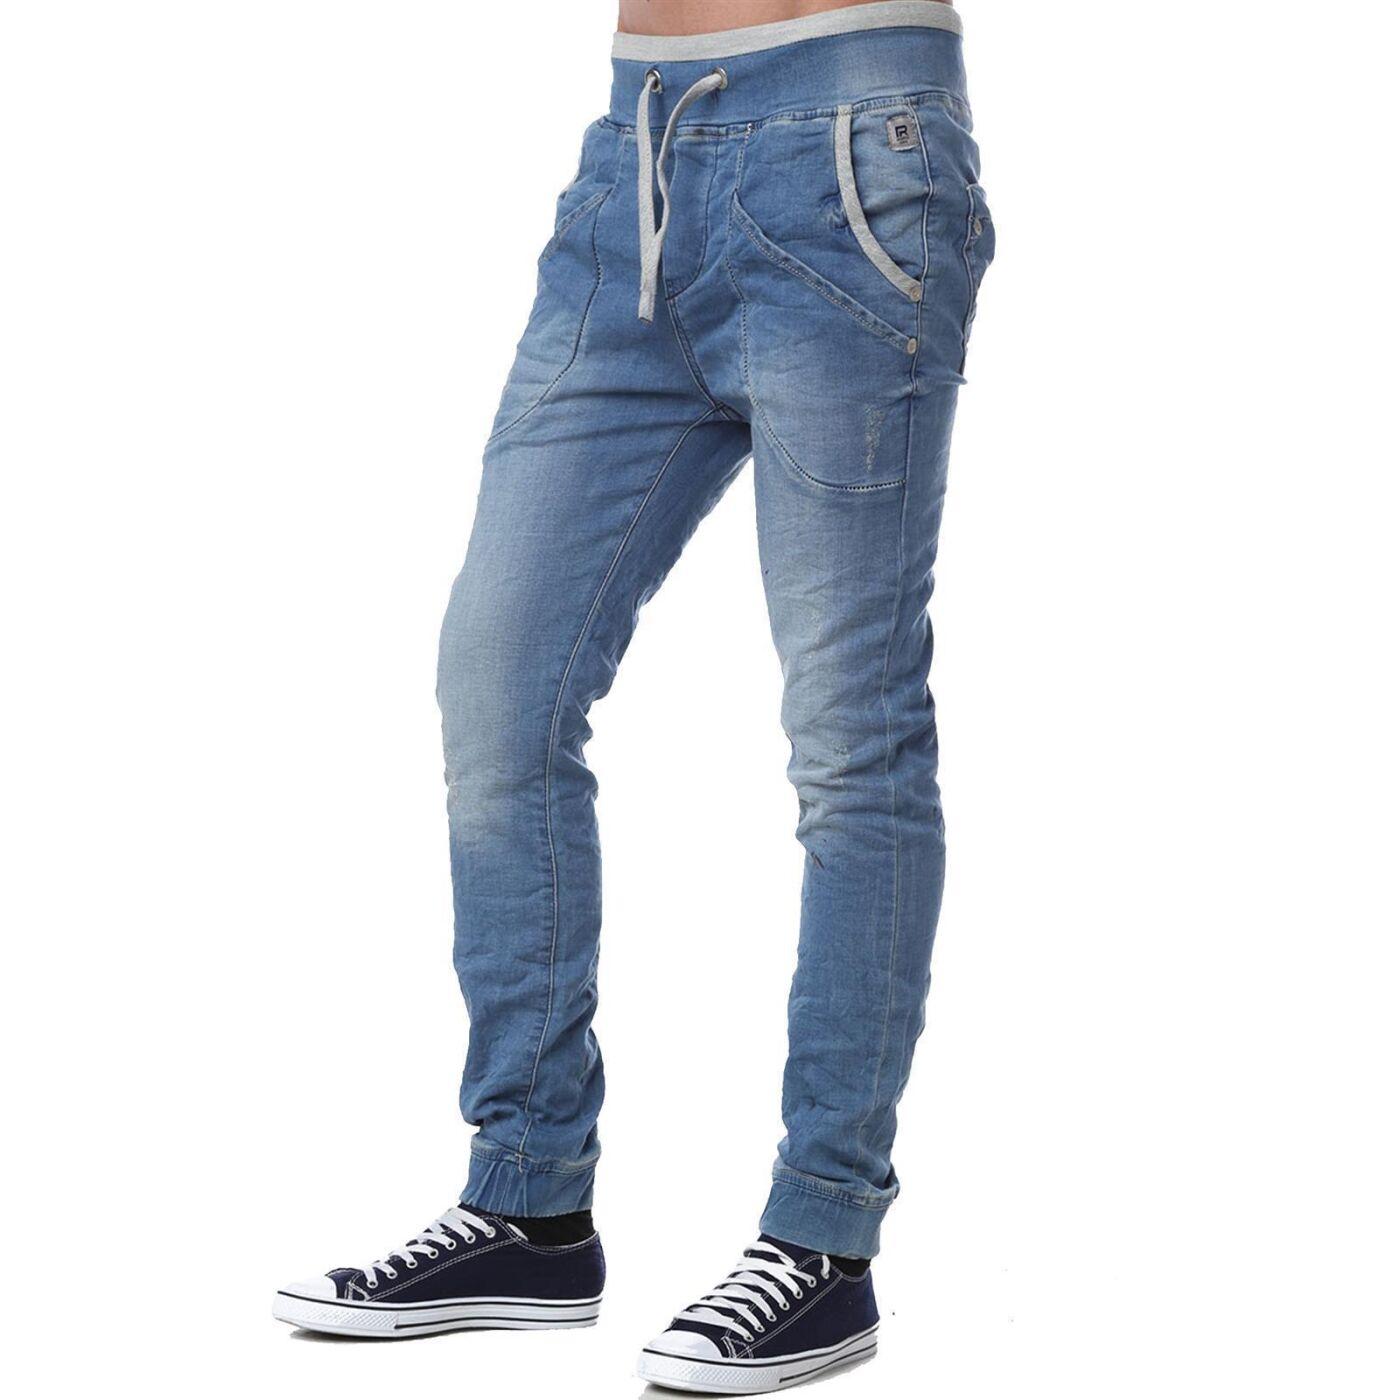 Denim Jeans M4025 Herren Jogg Blau Mit Gummizug Hose Red Bridge QECrxBedoW